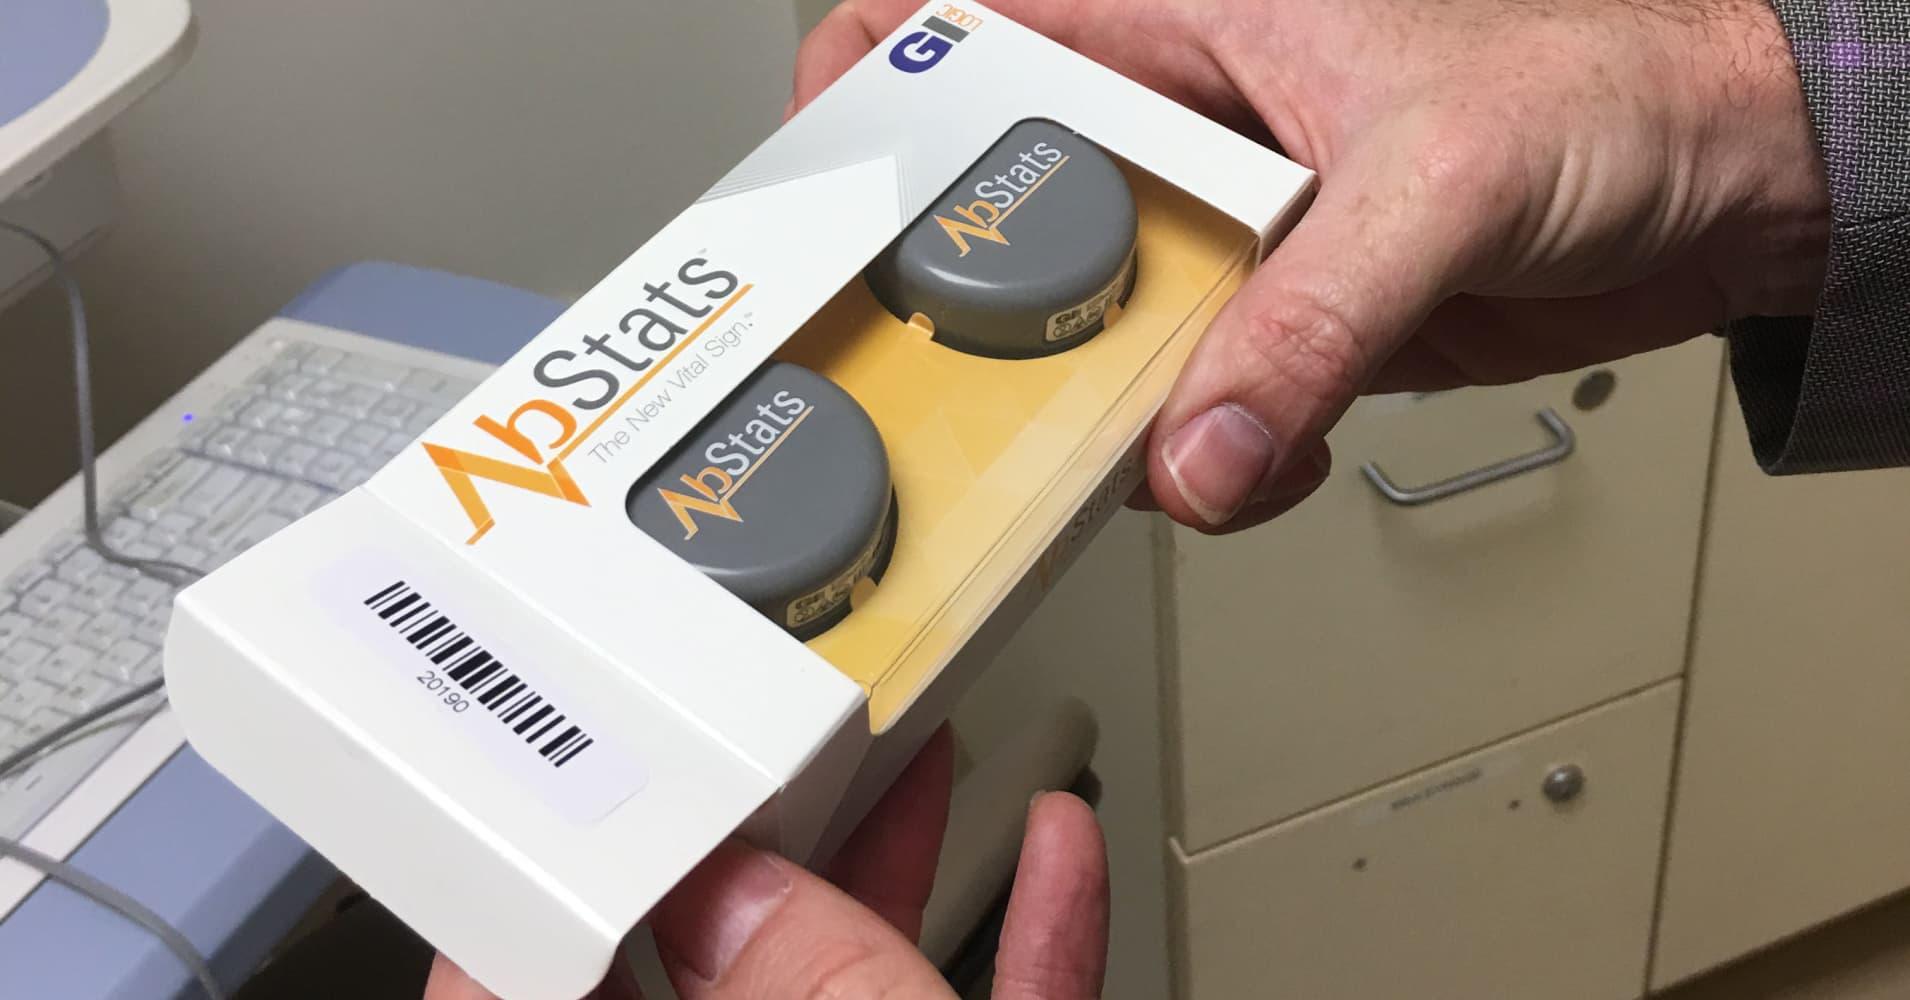 Adipex diet pills image 4